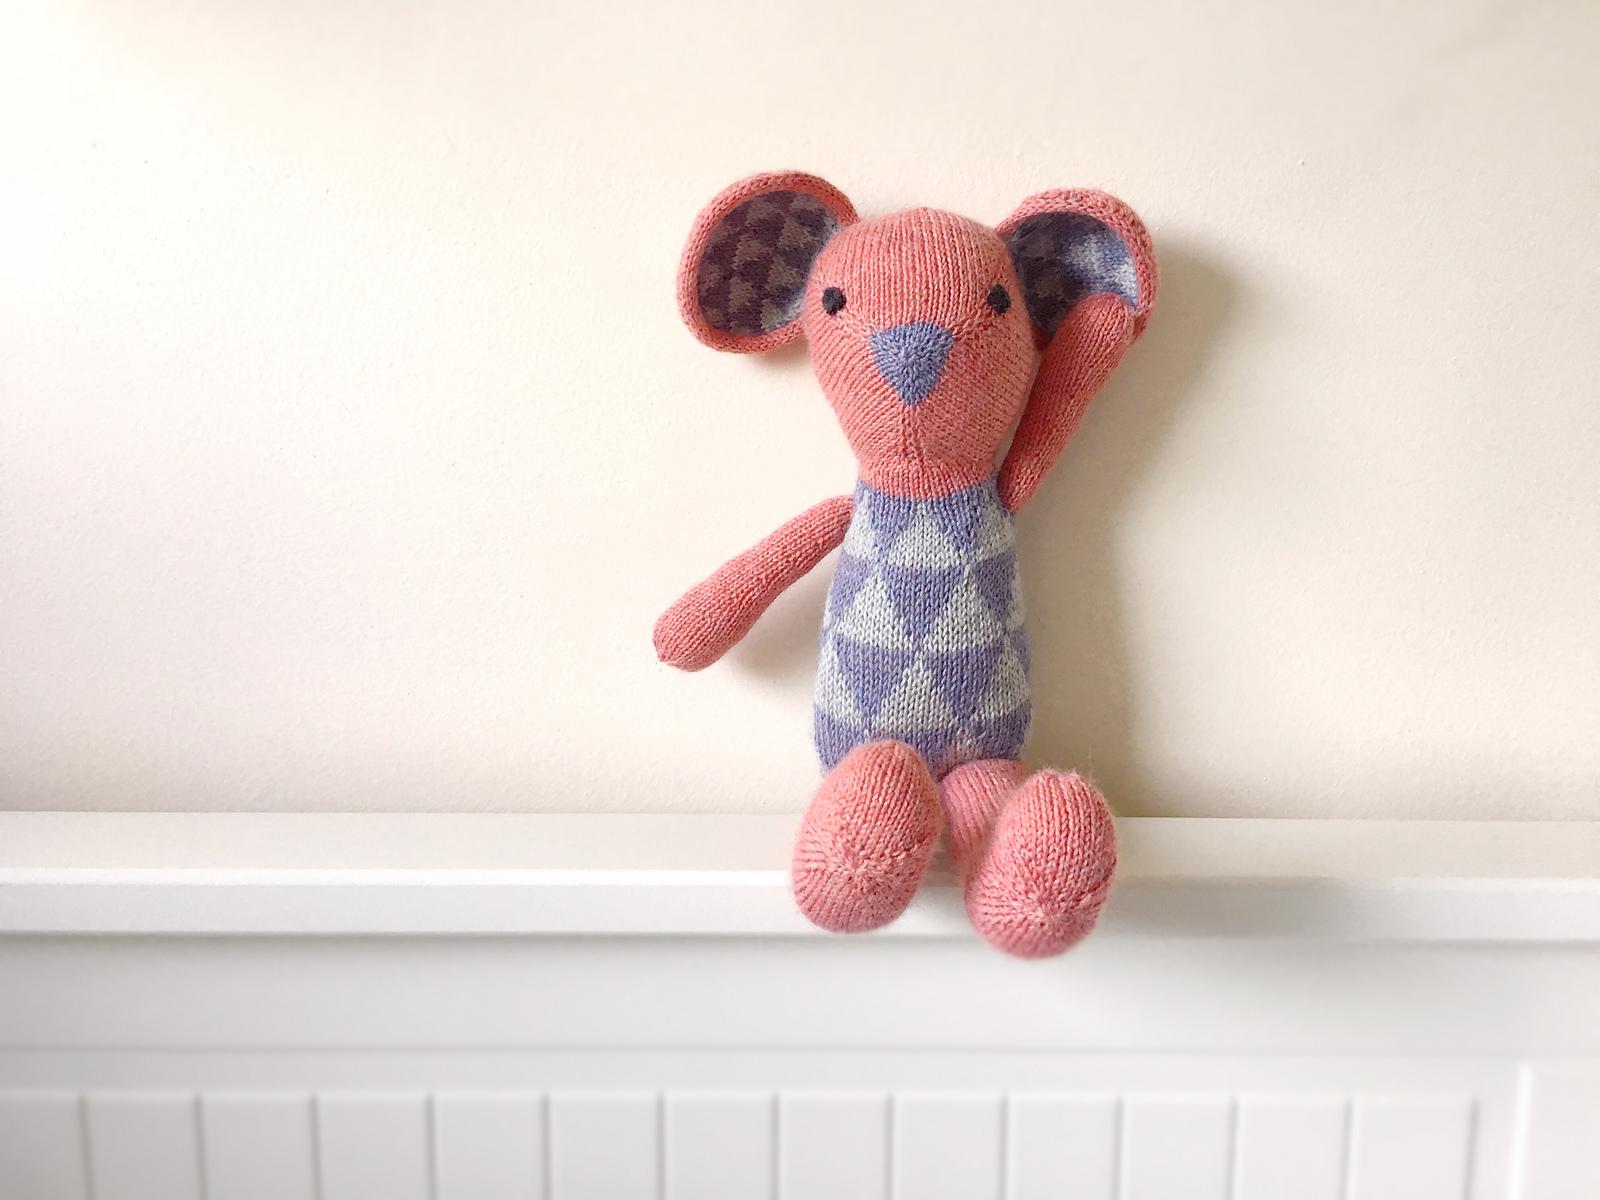 Mimi's (mimicodd on Ravelry) Alex the Mouse